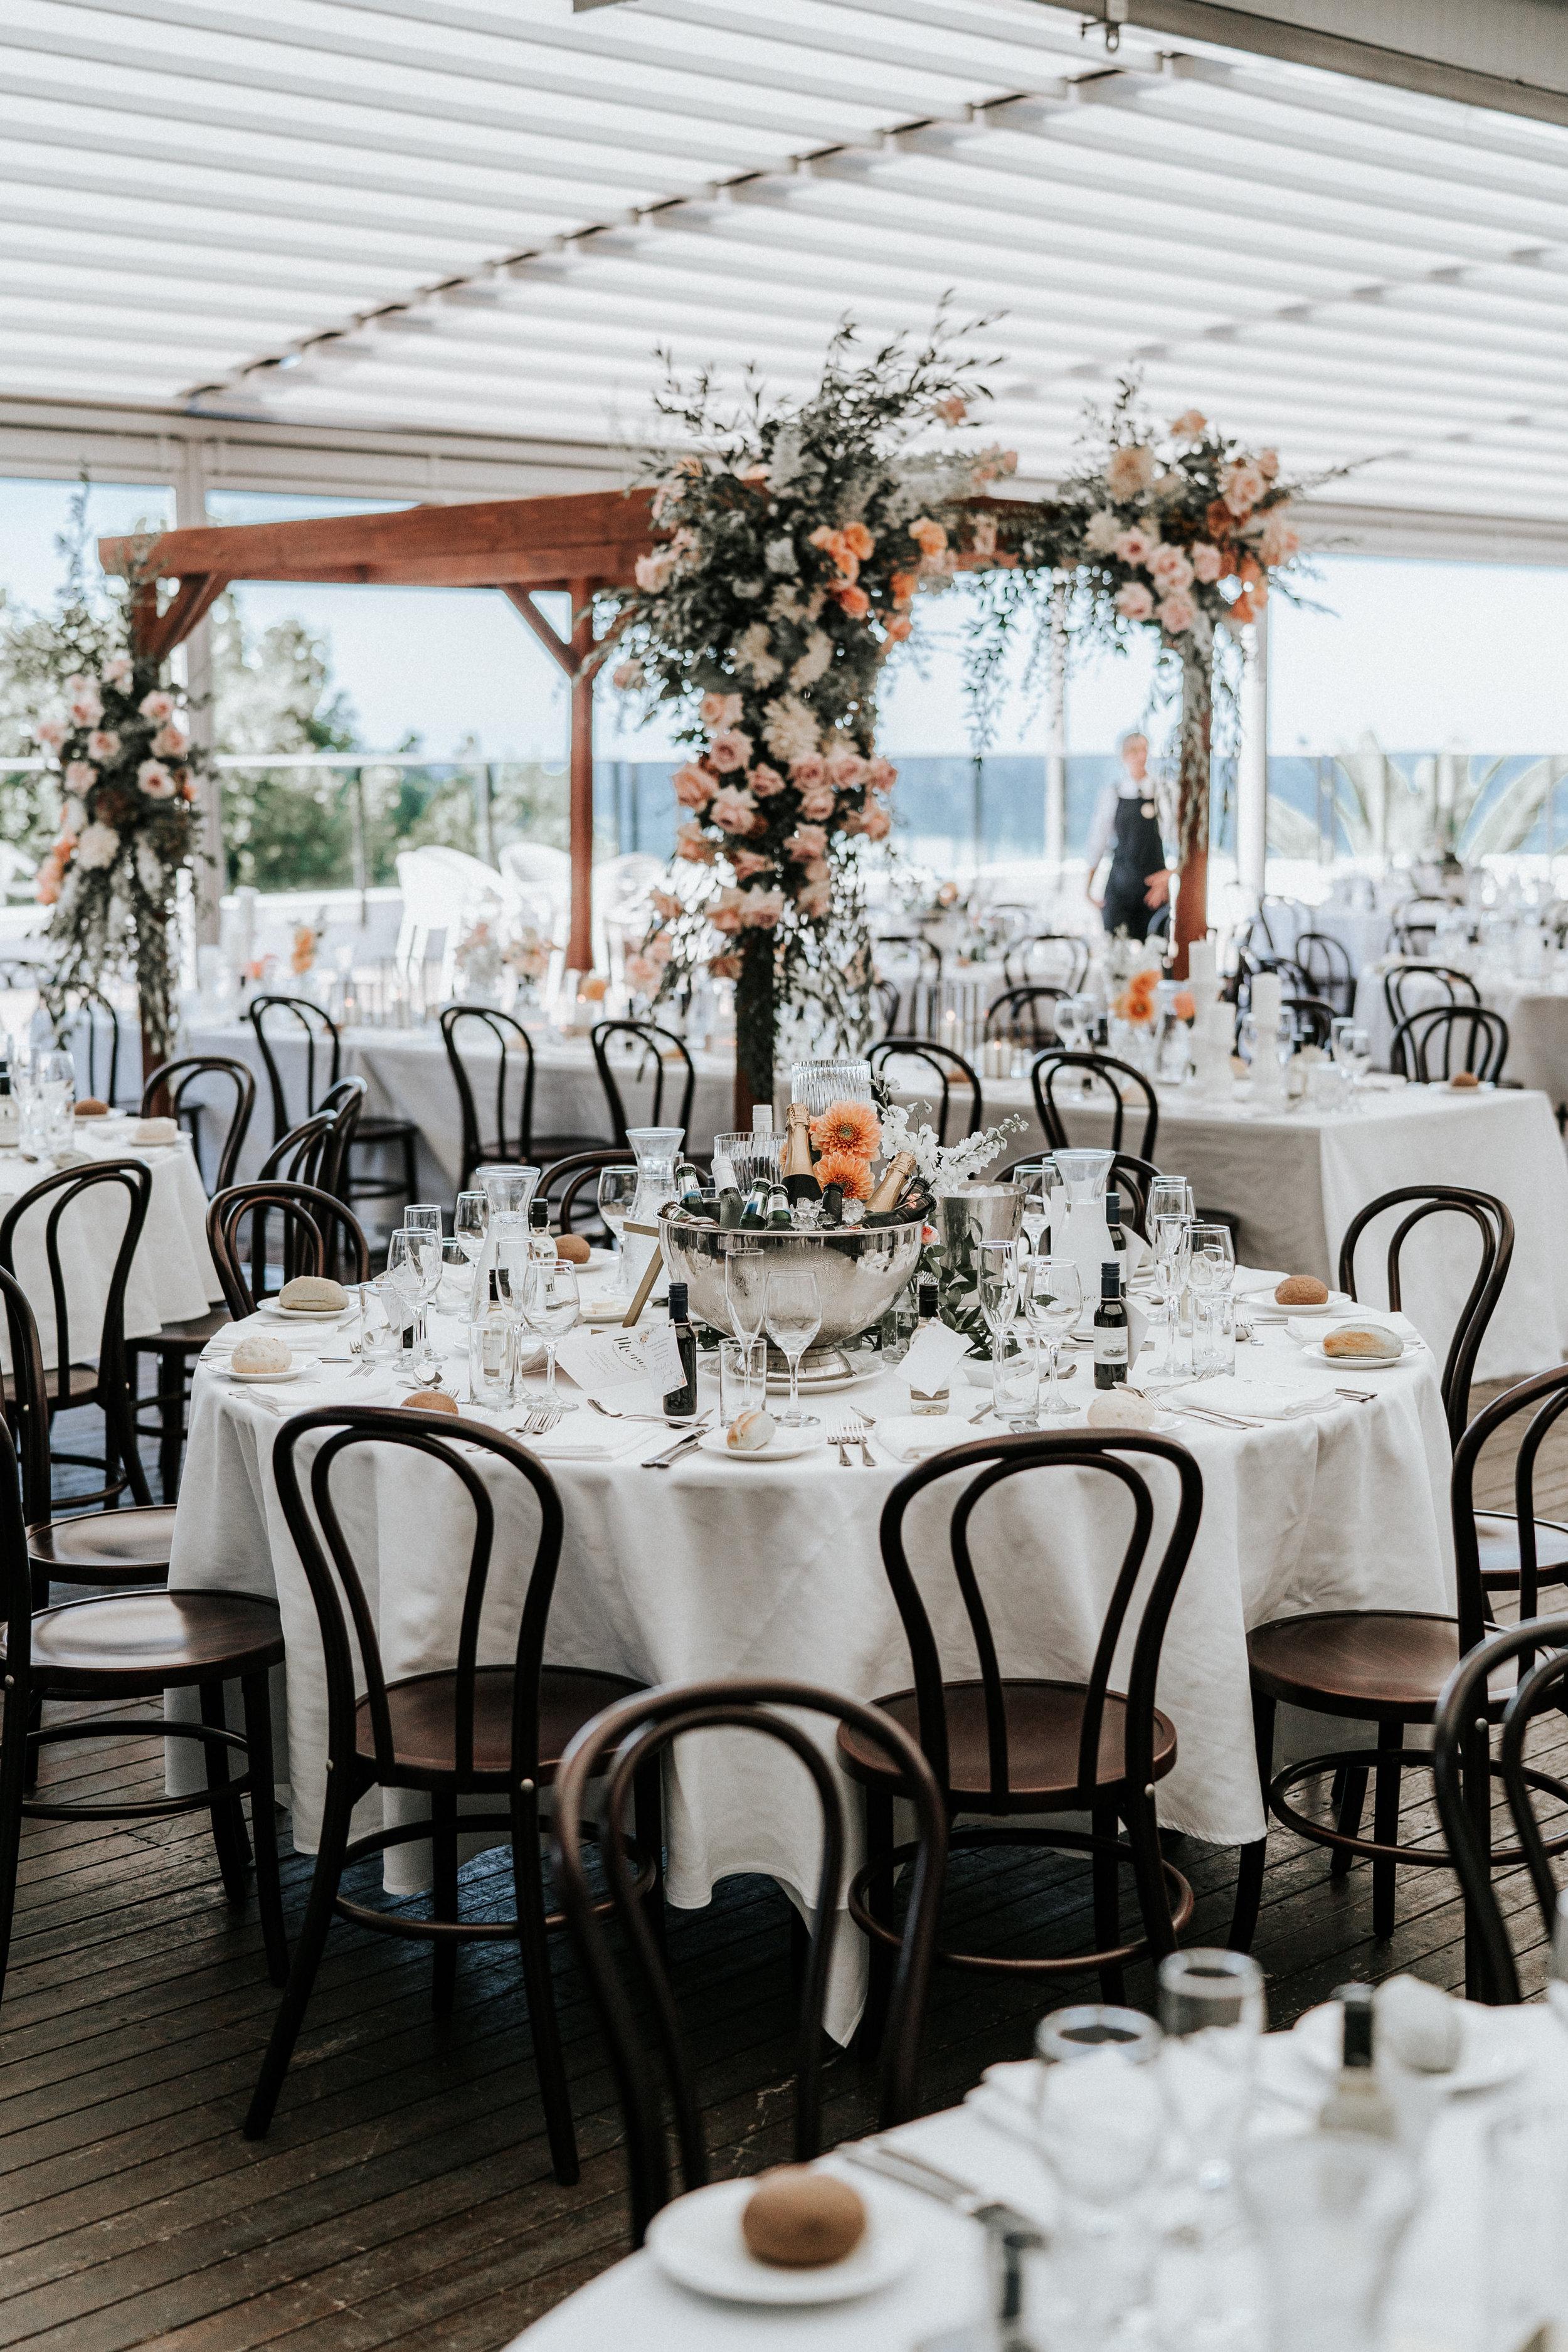 michelle-jonathon-harley-wedding-743.jpg